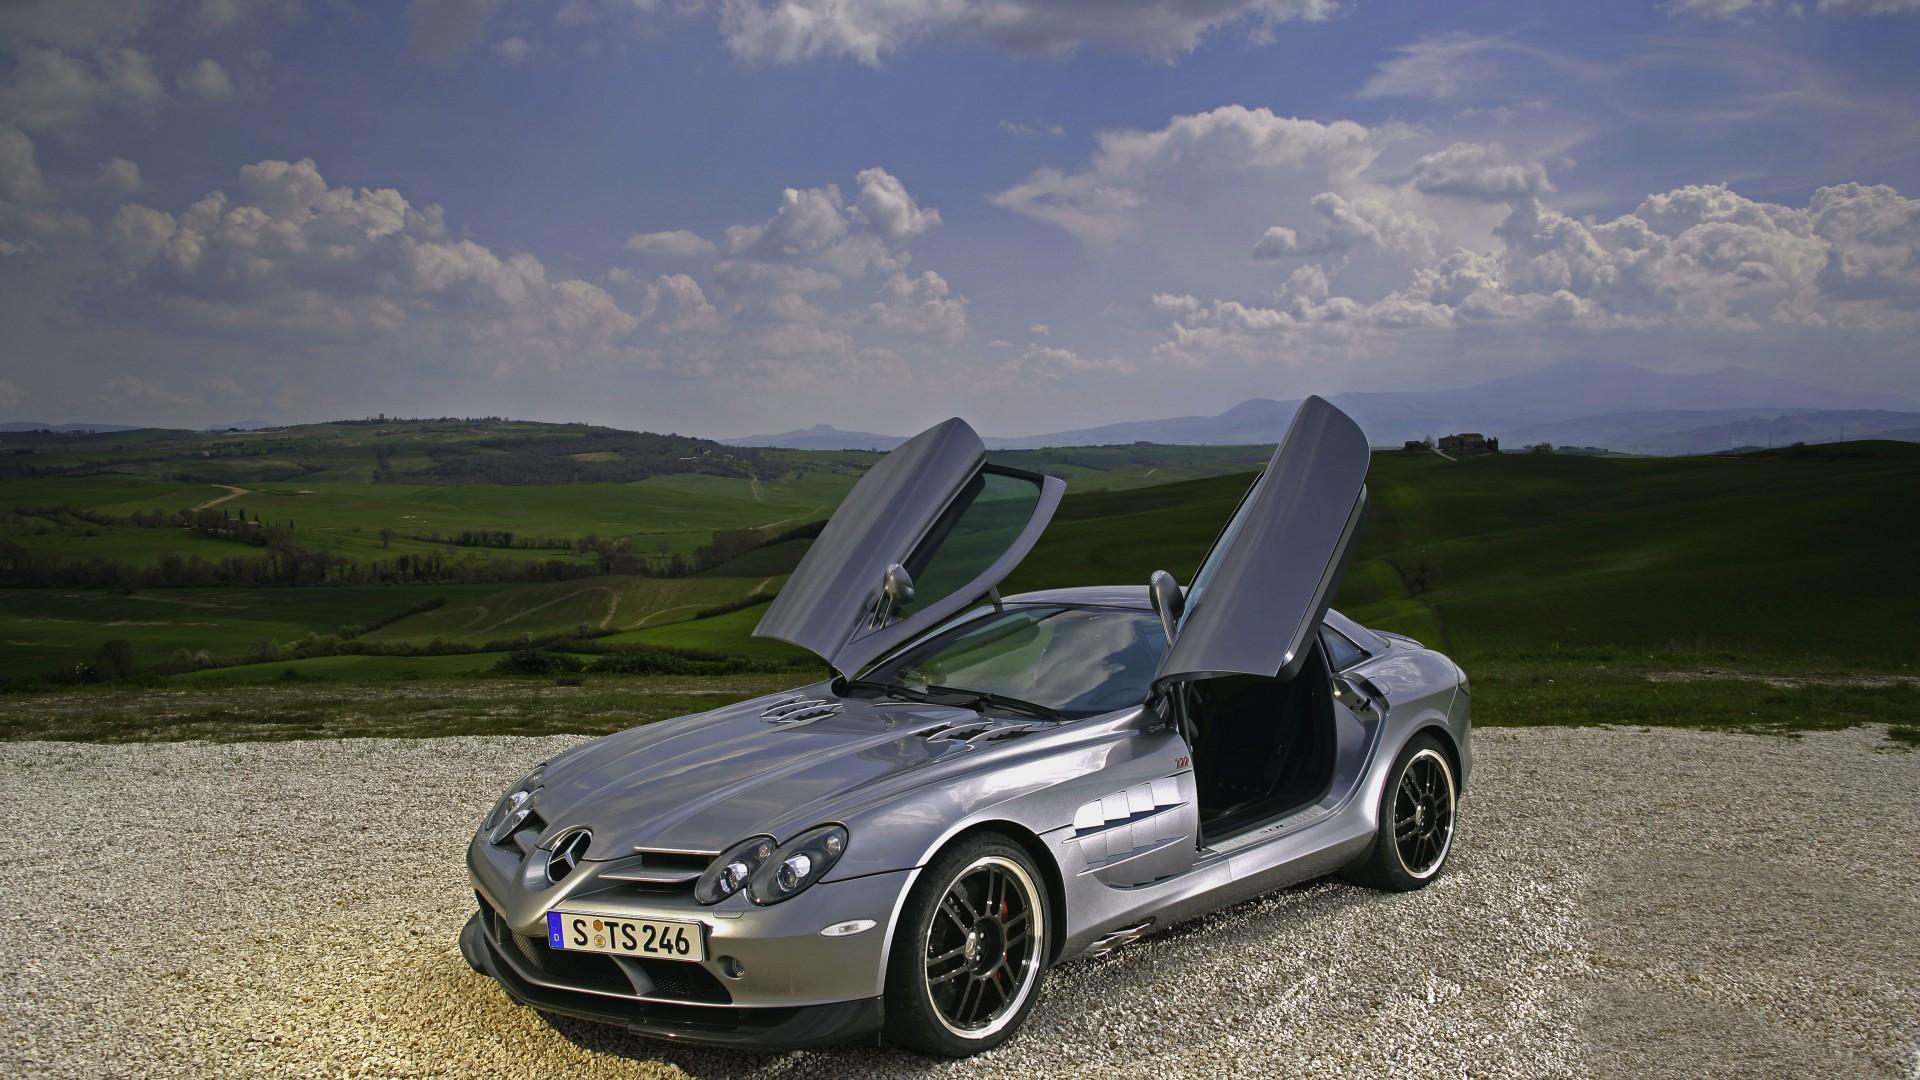 Wallpaper mercedes benz slr mclaren supercar mclaren for Mercedes benz luxury car